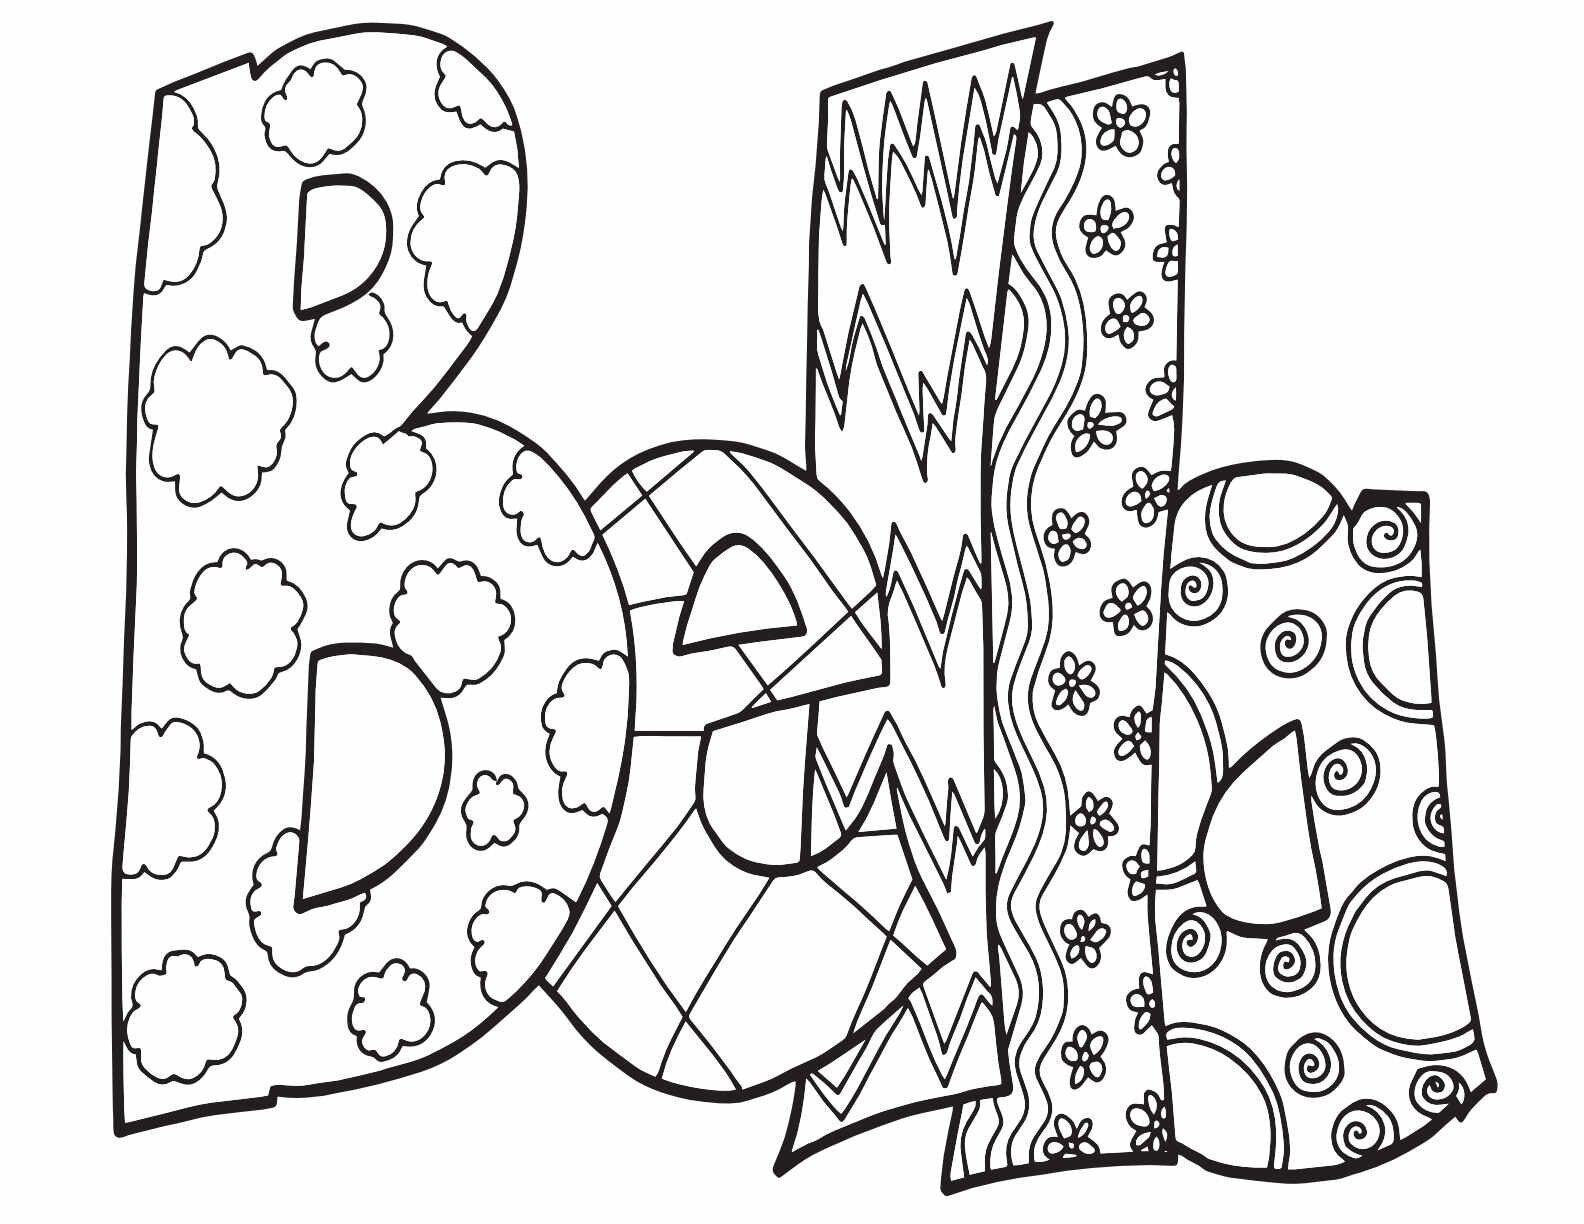 BELLA - Free Printable Coloring Page — Stevie Doodles | Free printable coloring  pages, Free printable coloring, Coloring pages